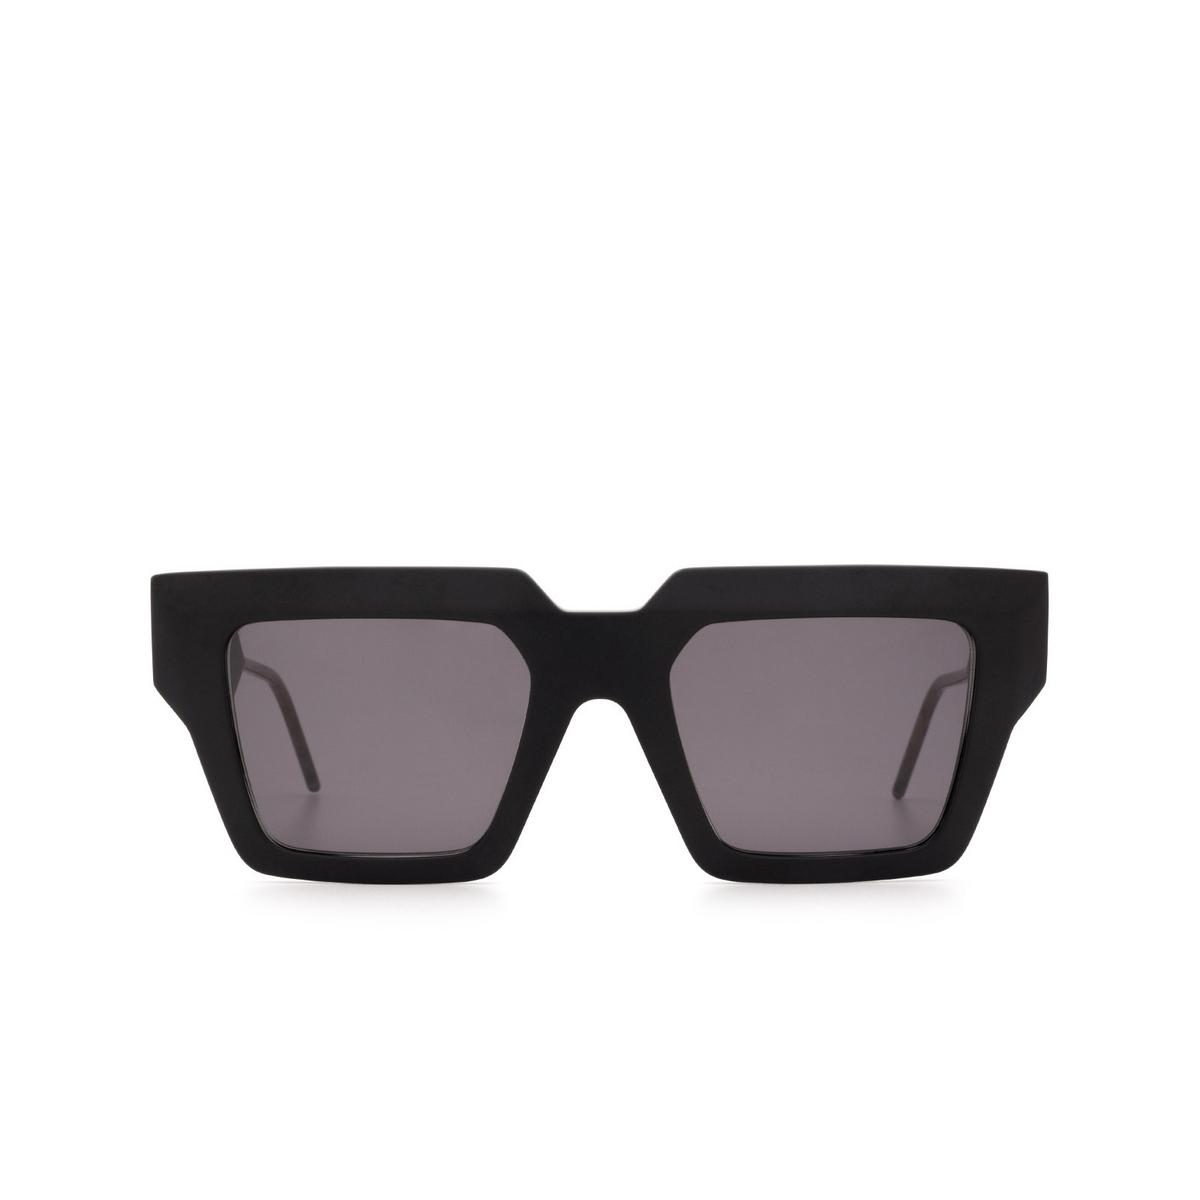 Soya® Square Sunglasses: Hedi color Matte Black Bkm-fs - front view.